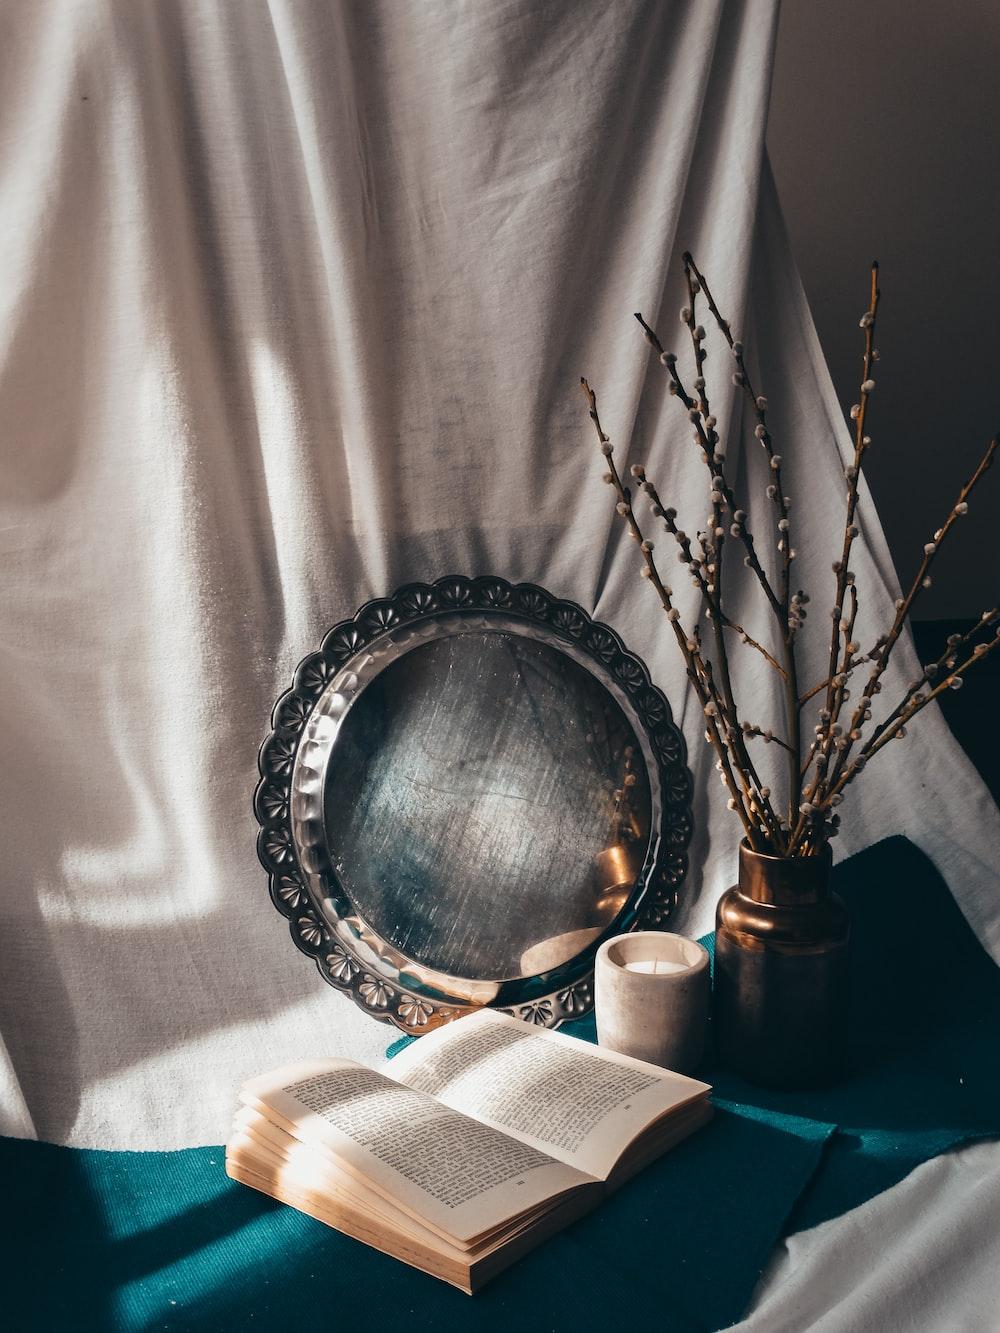 silver round framed mirror on white textile